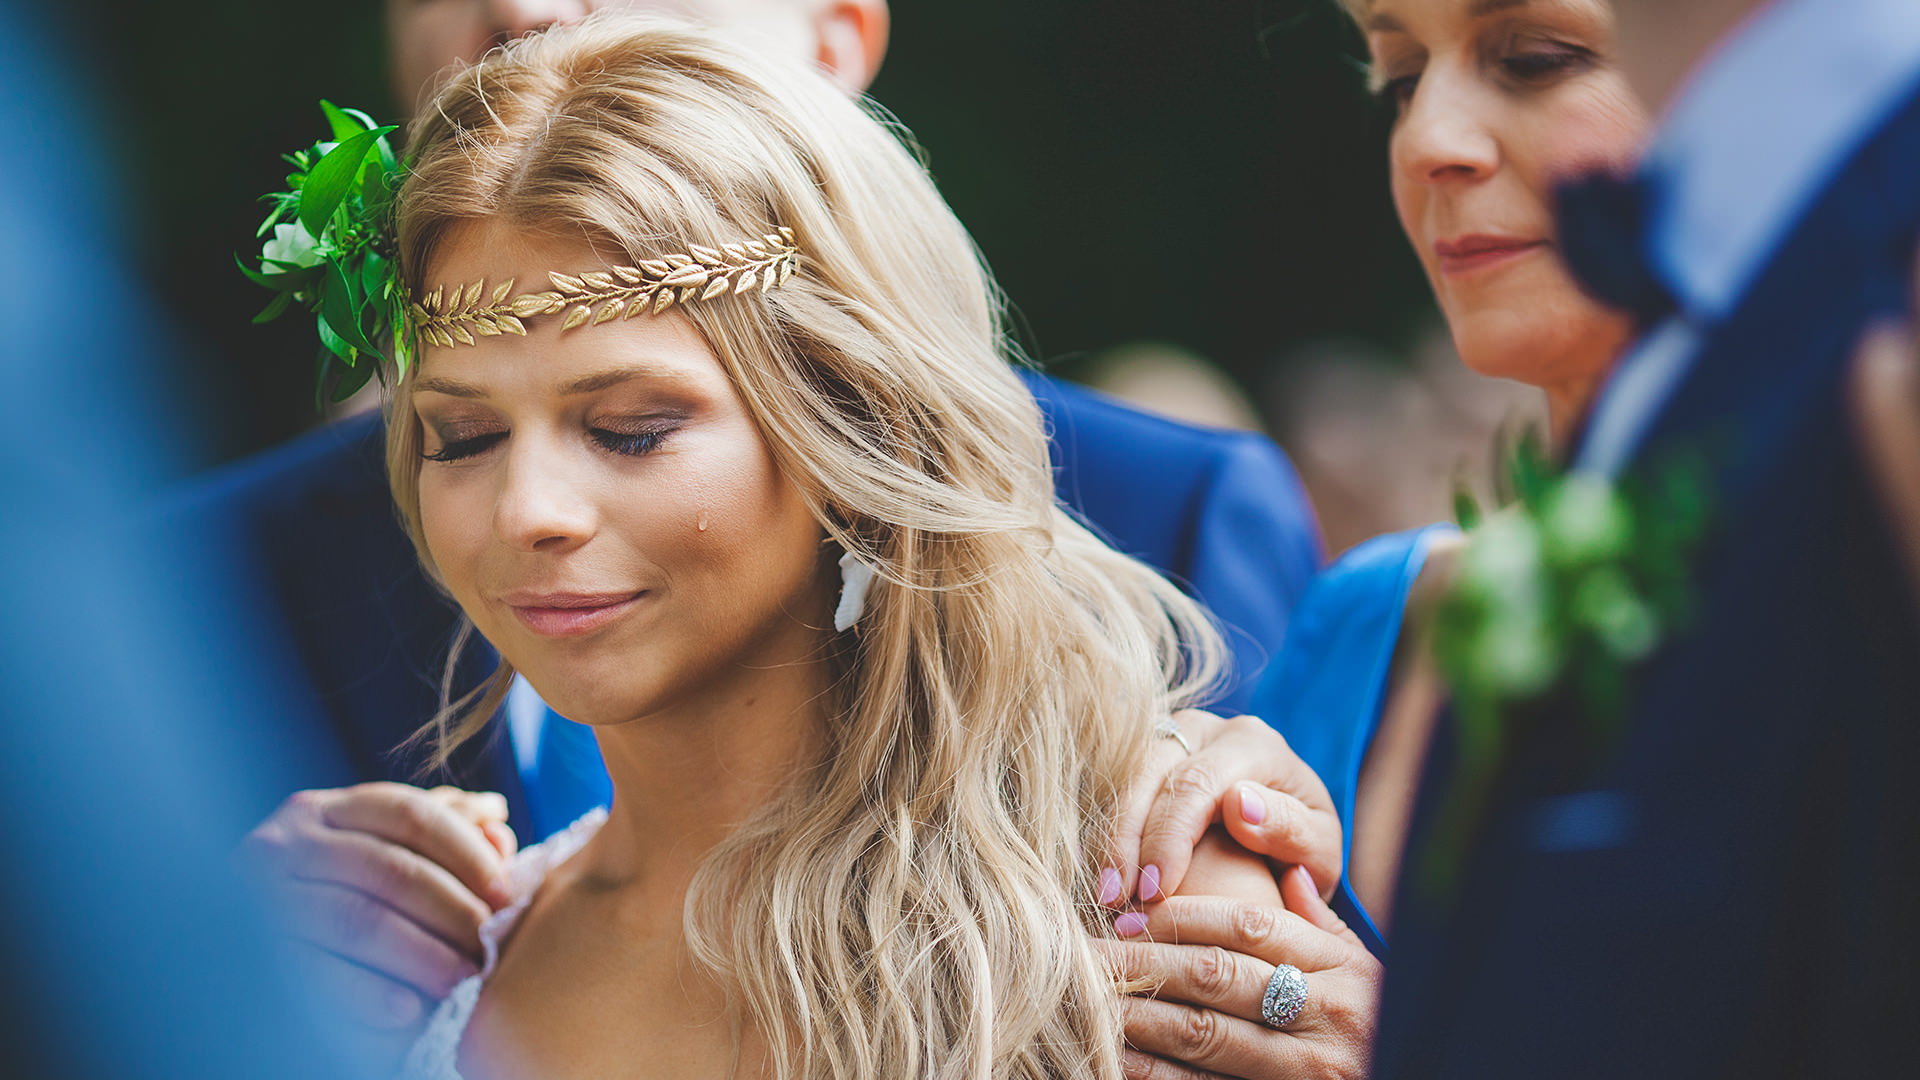 each wedding is unique